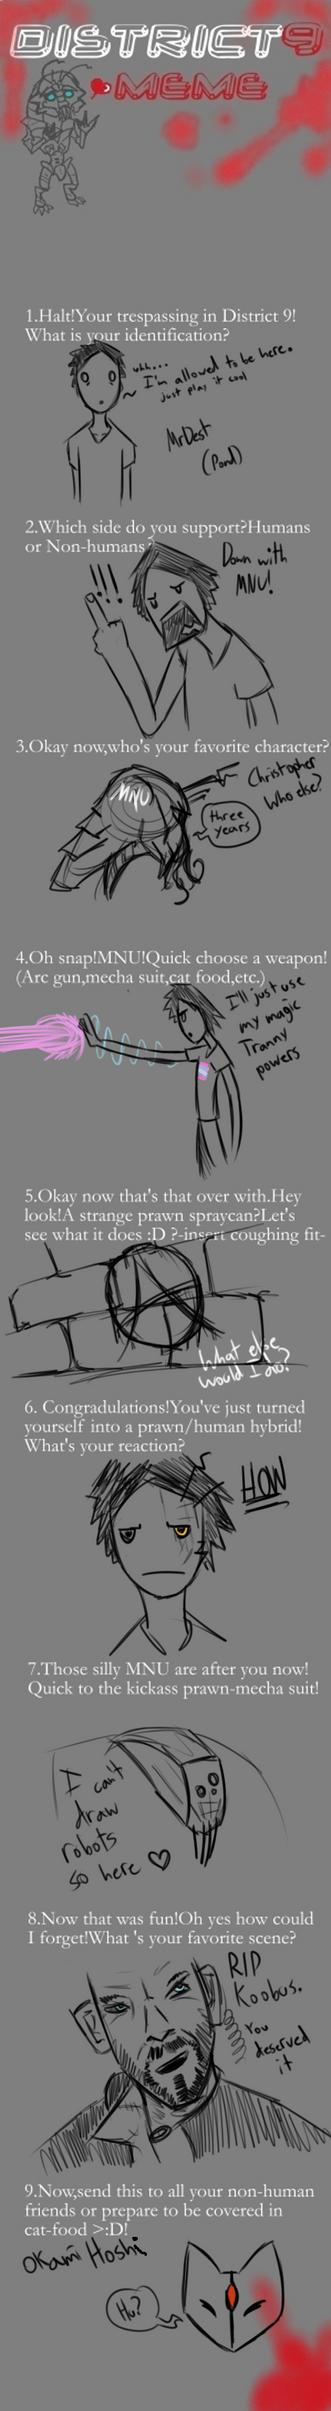 District 9 Meme by MrDest